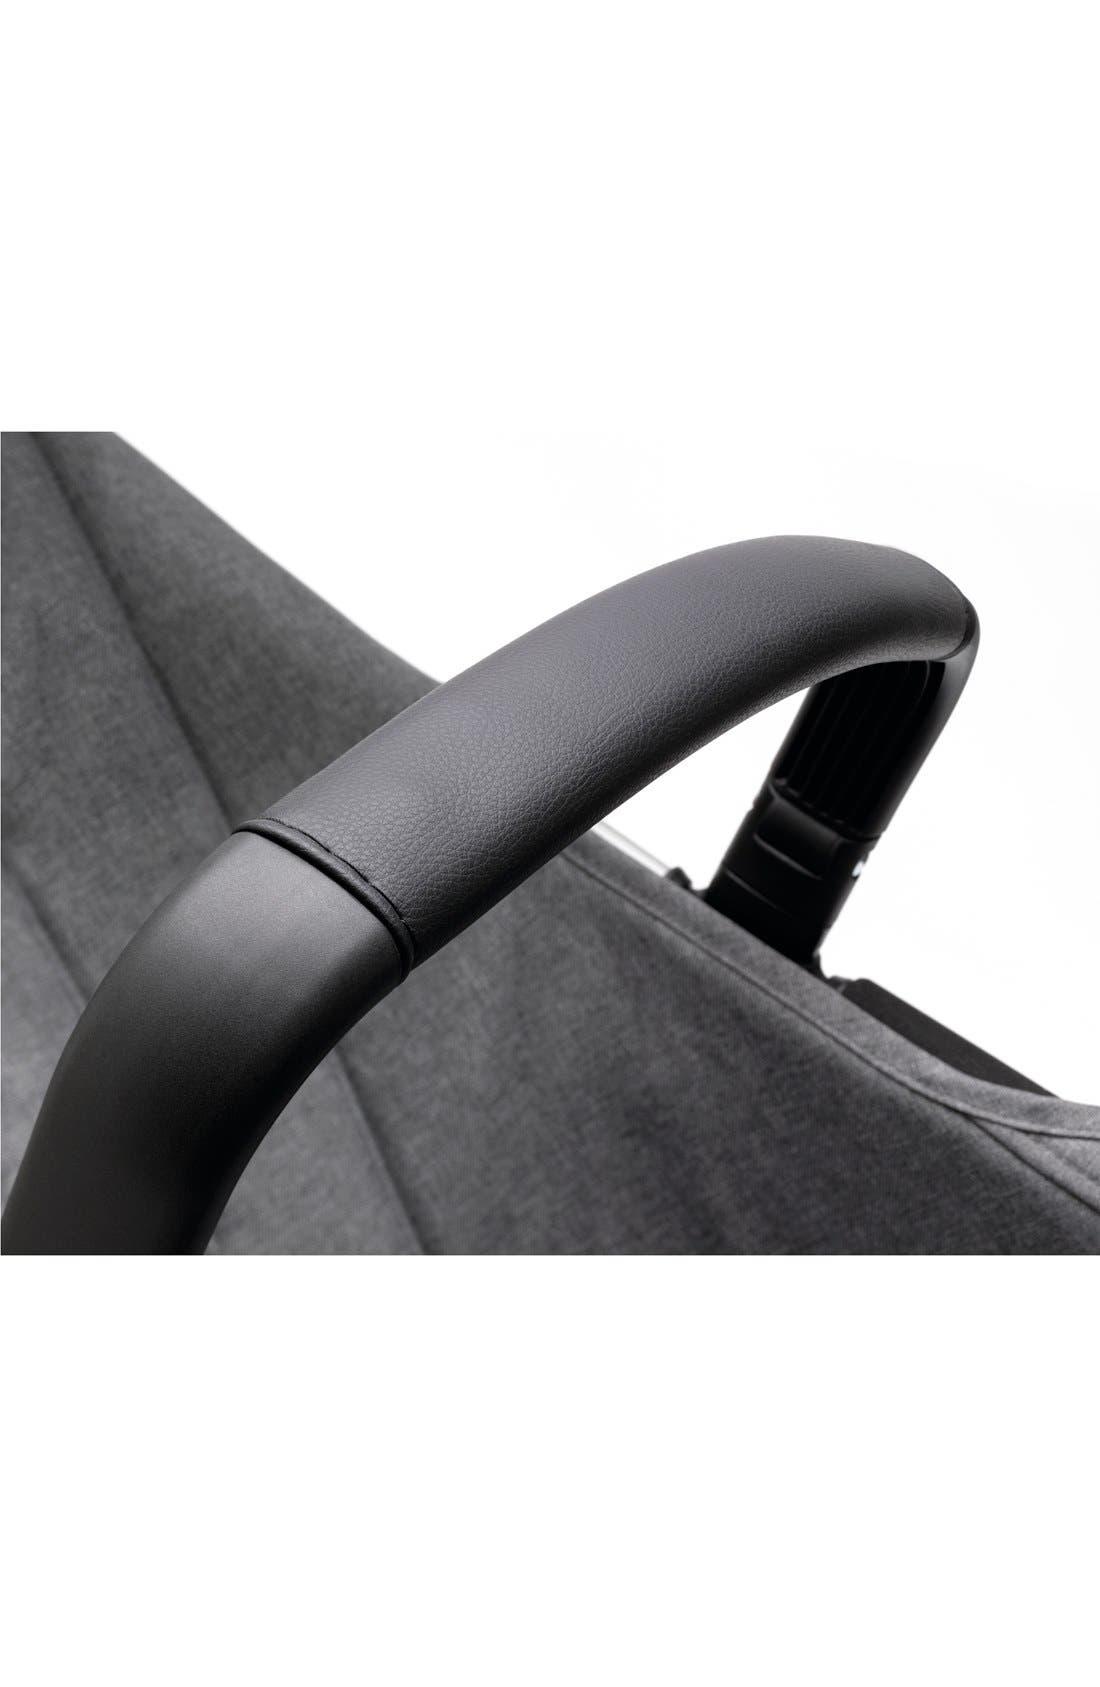 'Cameleon³' Aluminum Frame Stroller with Fabric Set,                             Alternate thumbnail 3, color,                             025